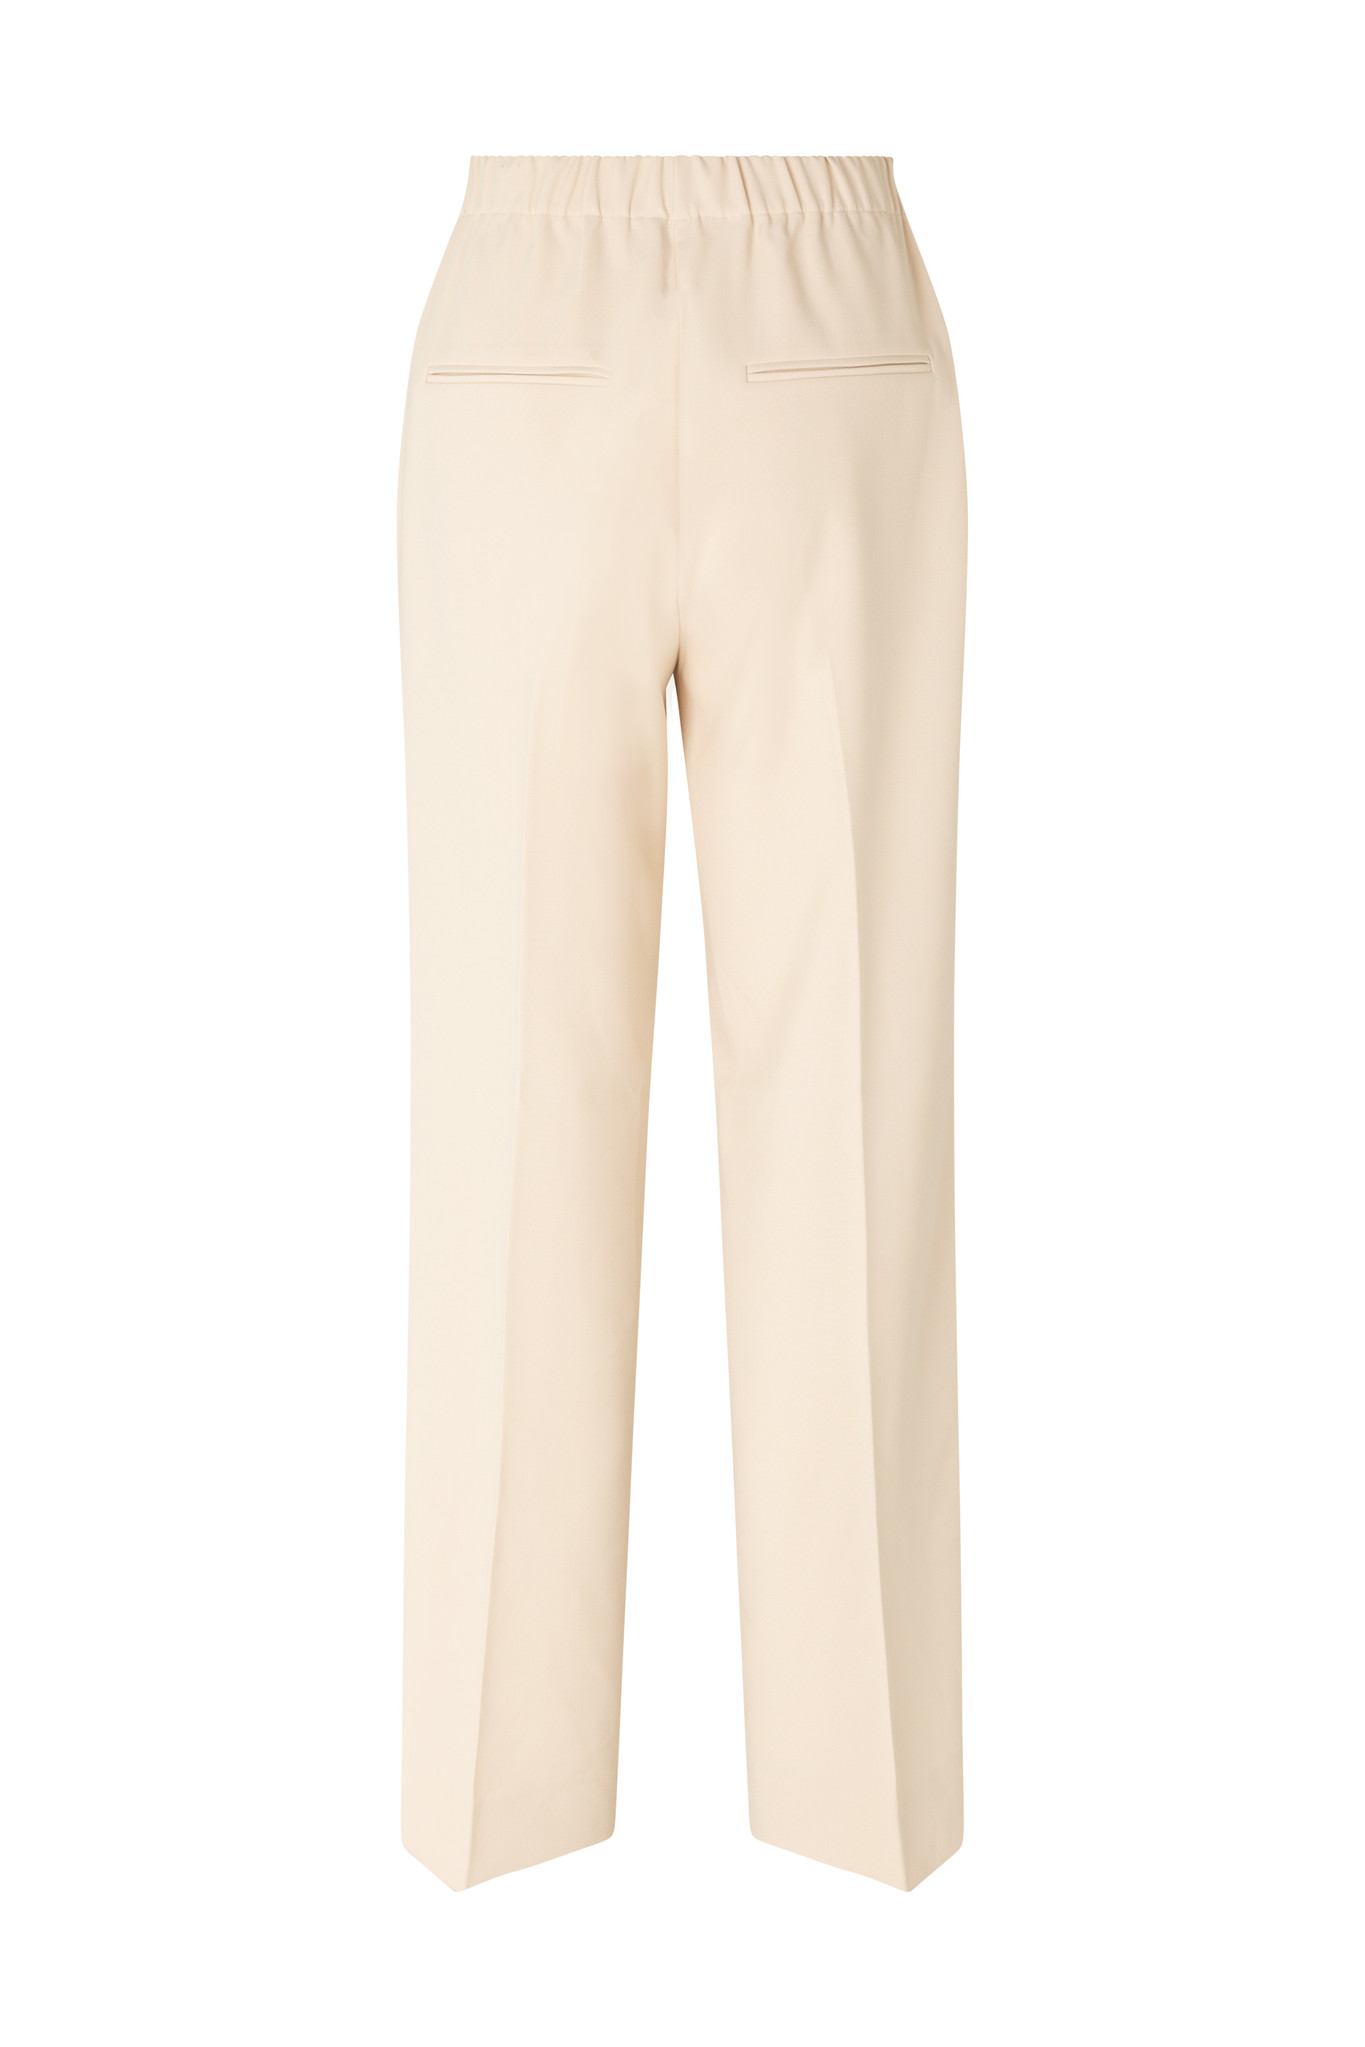 Evie Classic Trousers - Brazilian Sand-4